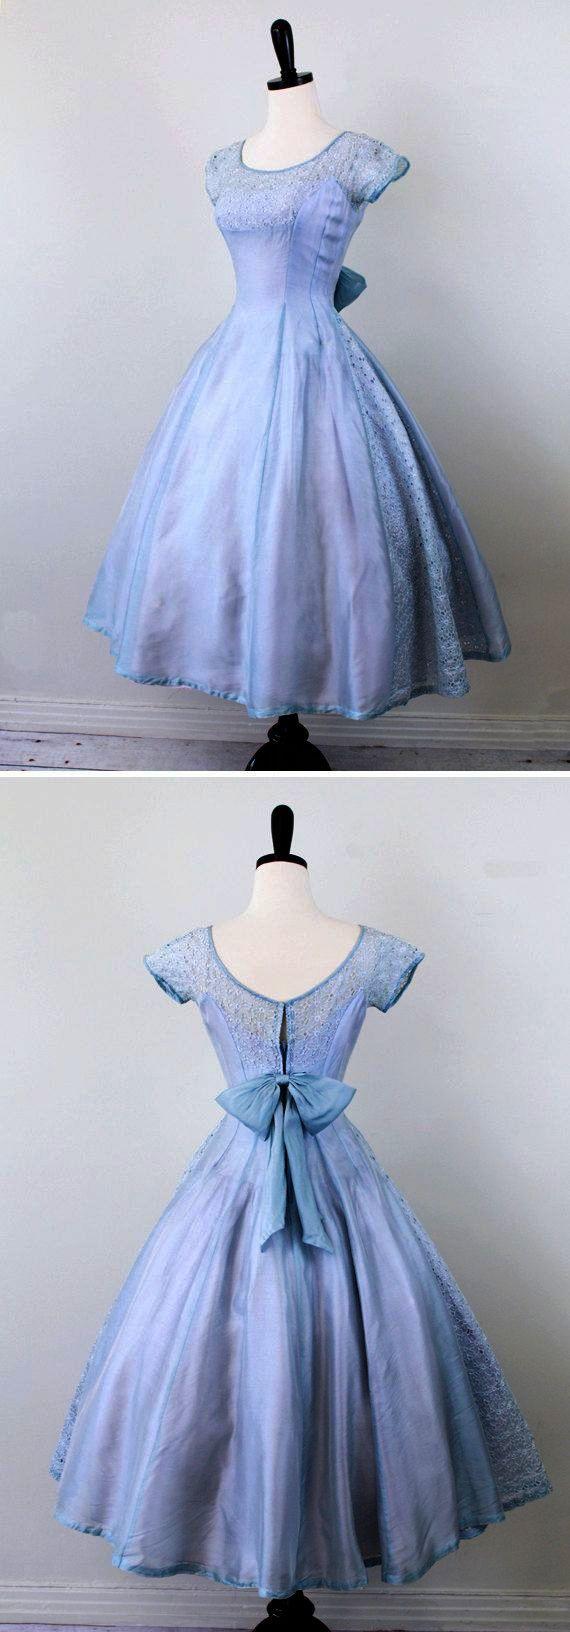 50/'s Party Dress